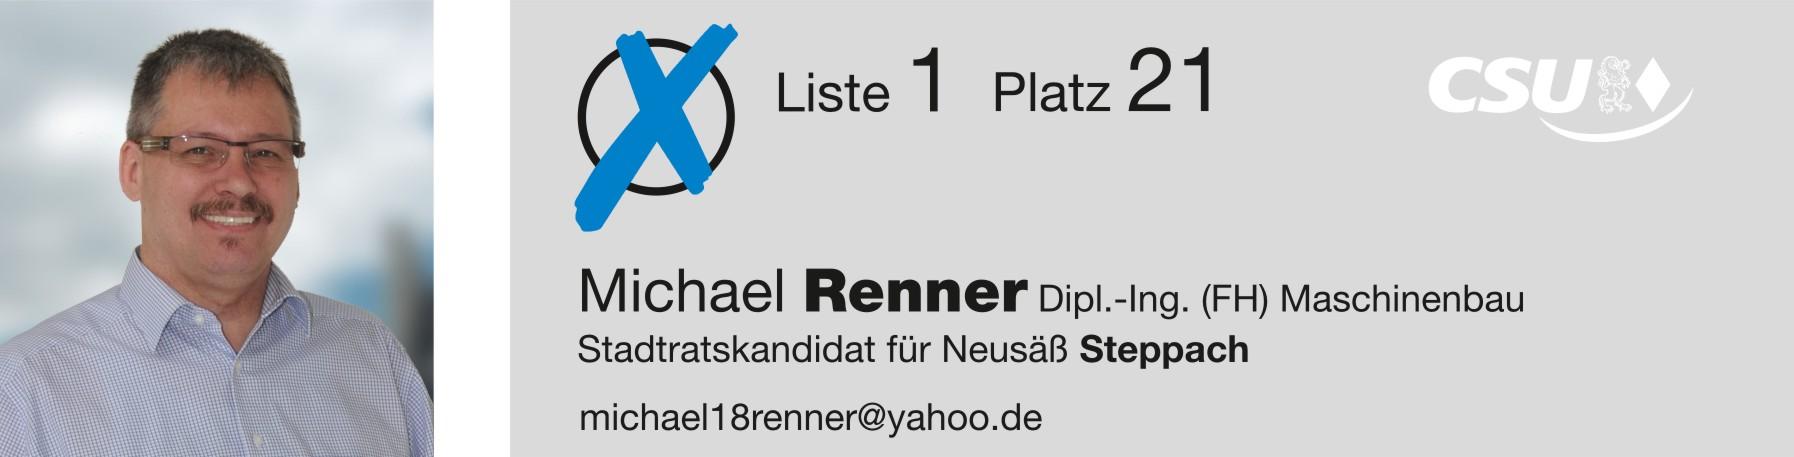 Michael Renner